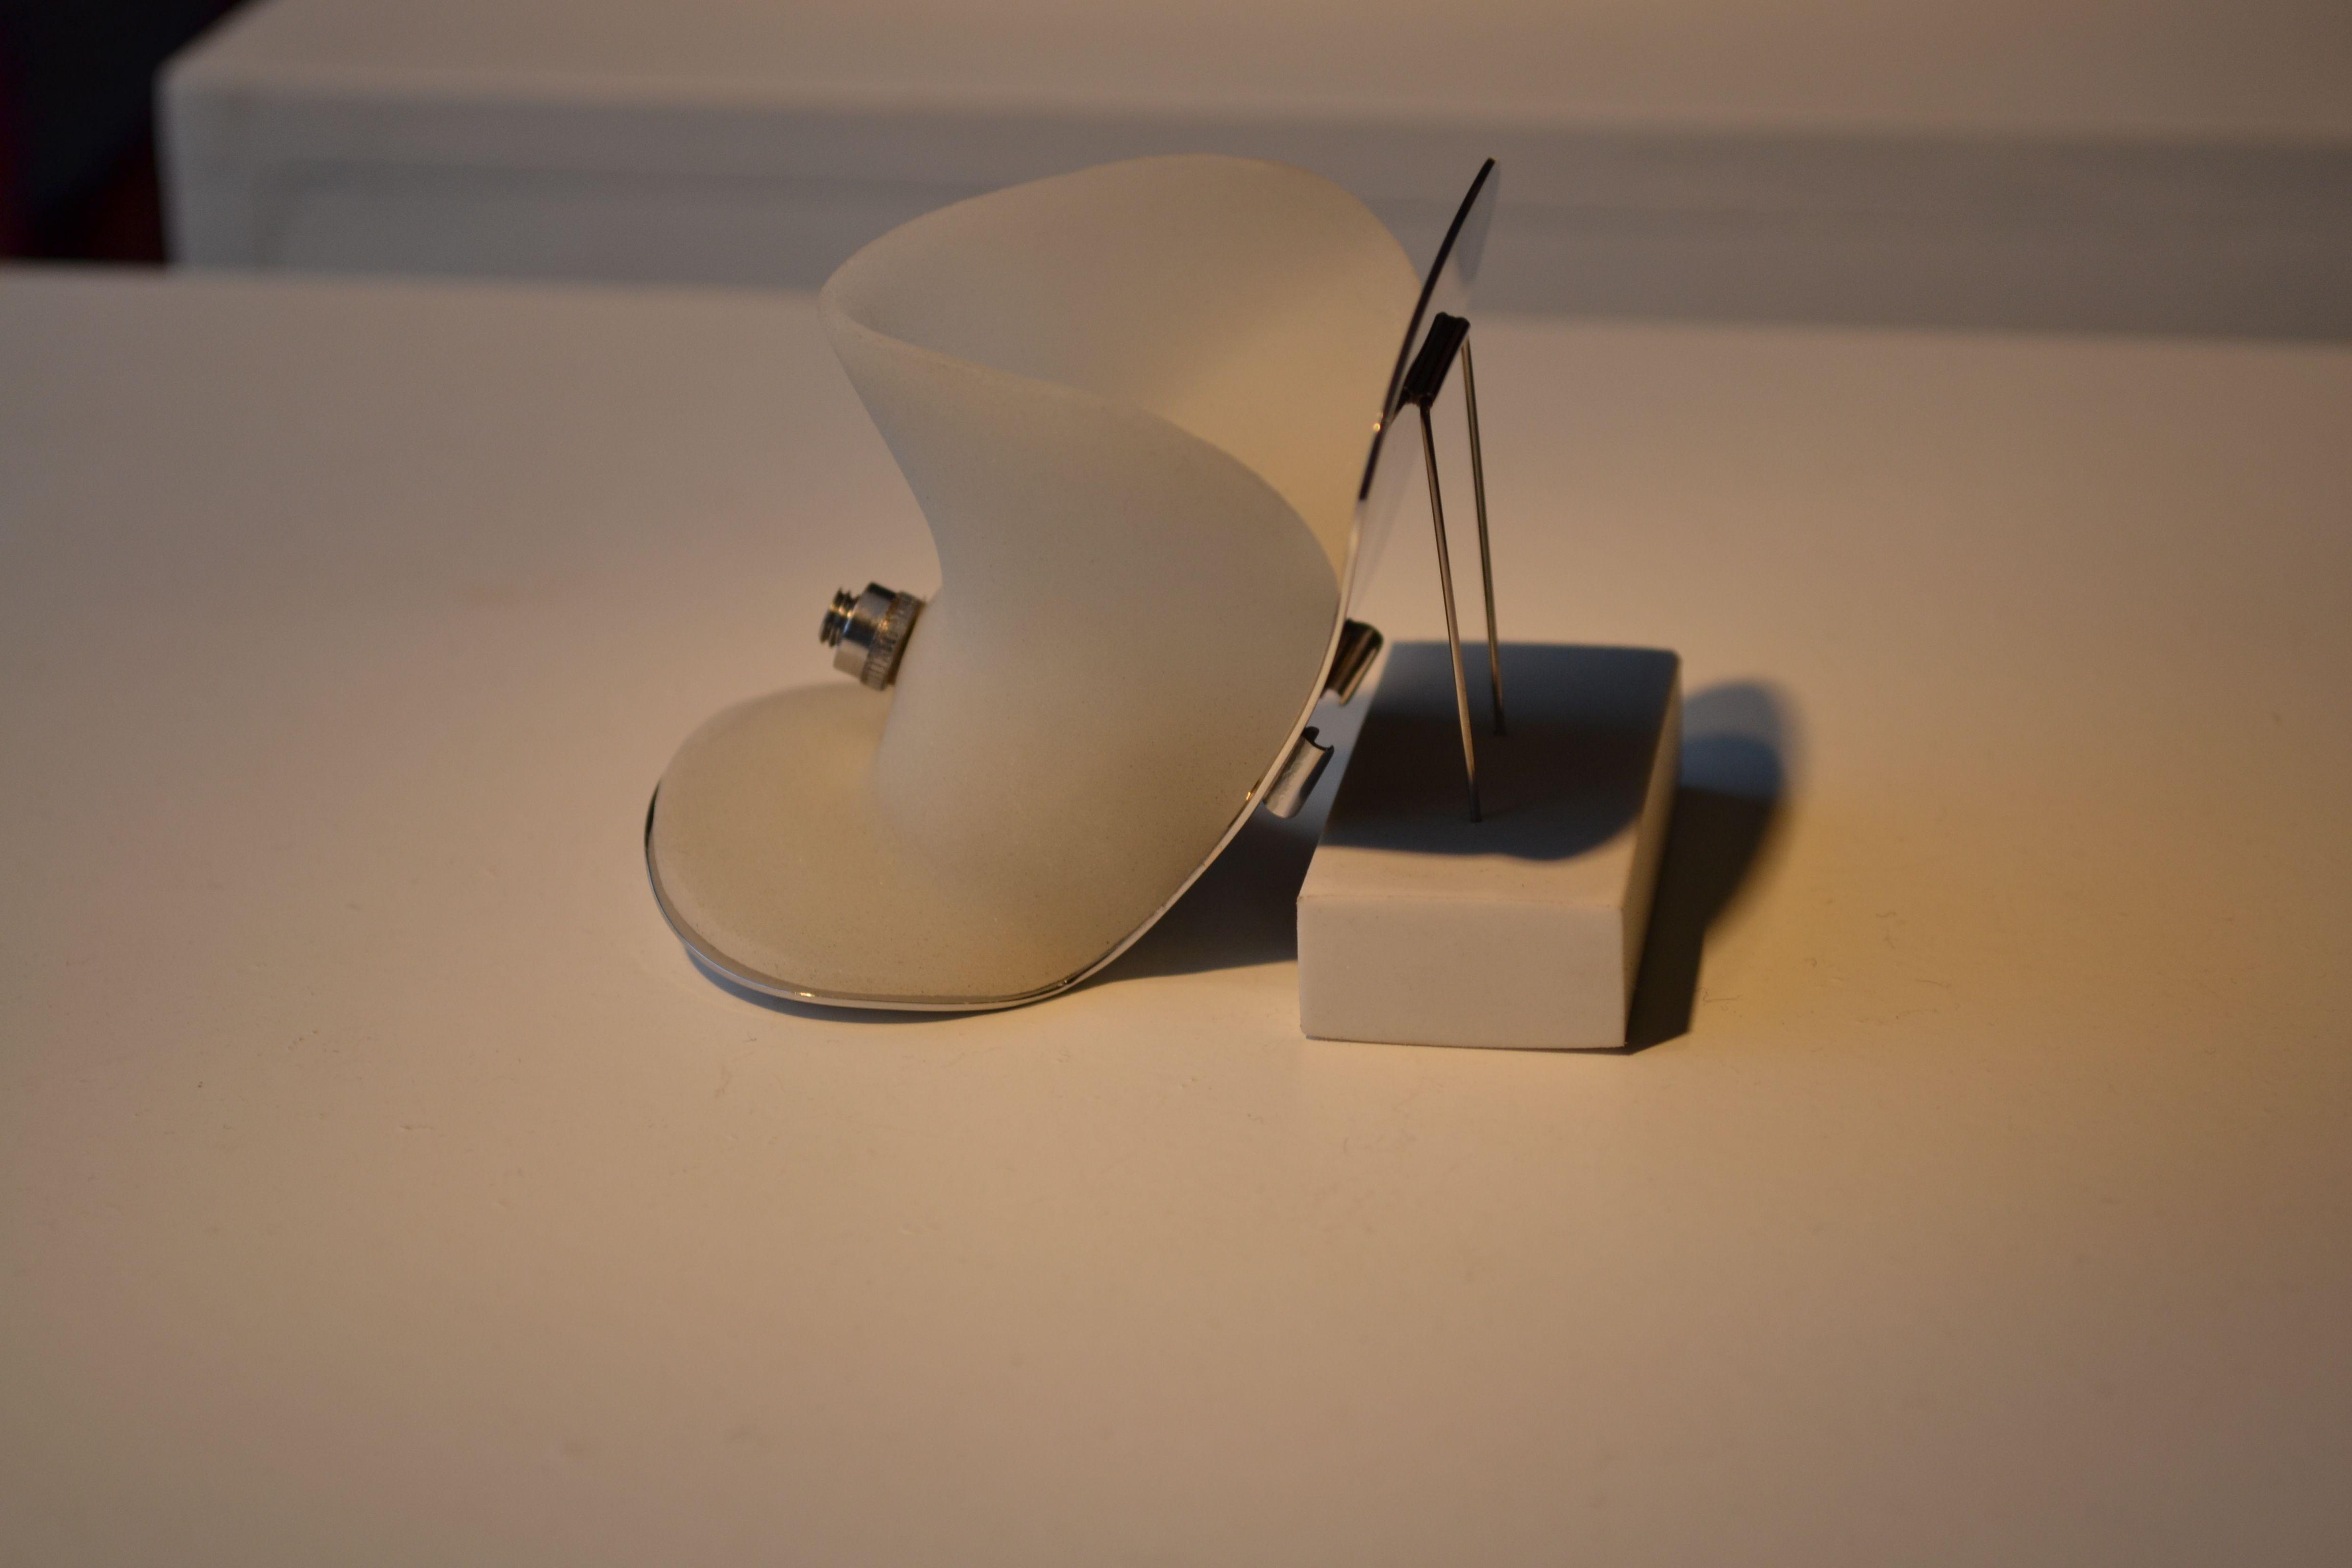 Galerie Rob Koudijs, Amsterdam, January 2014